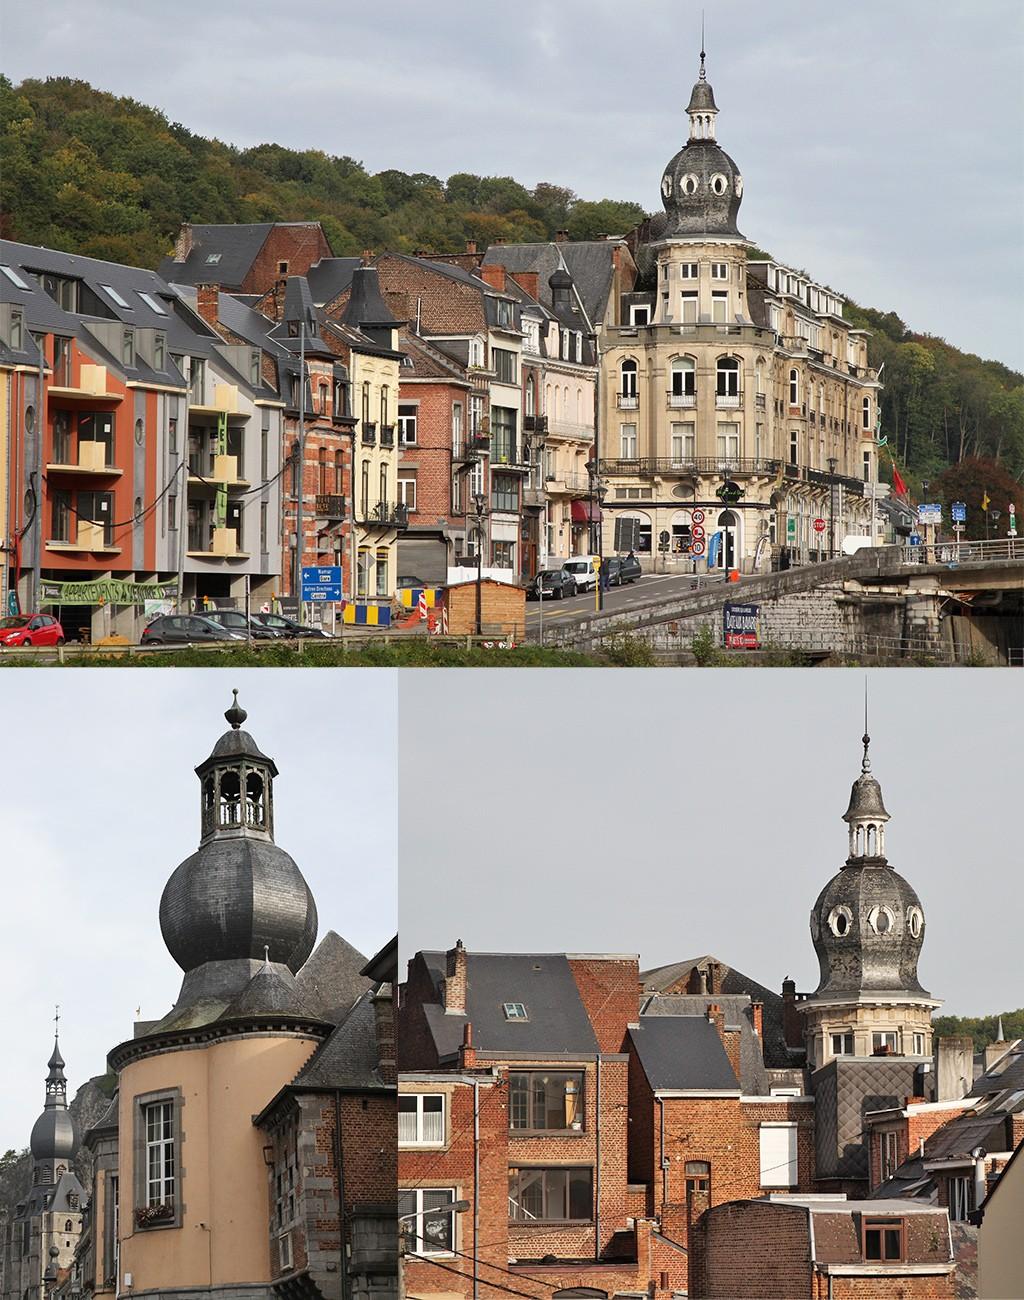 Dinant en Namen in foto's - torentjes in Dinant